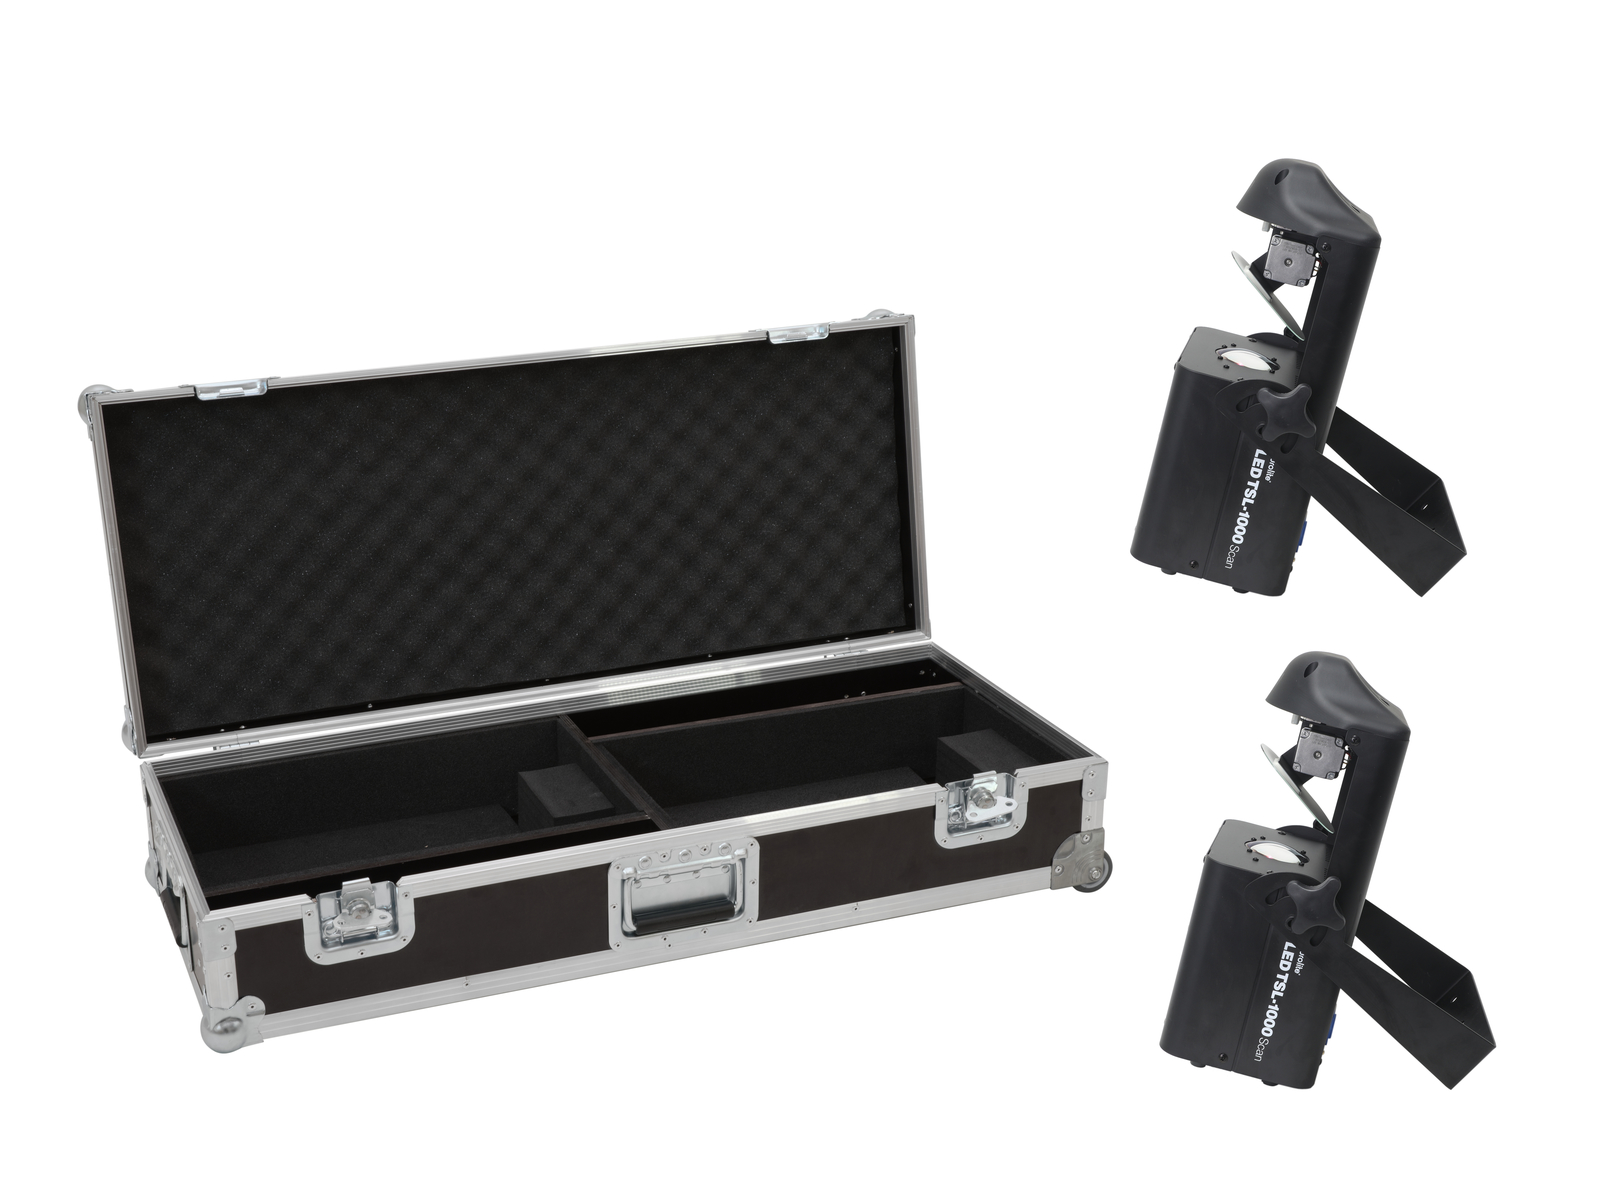 EUROLITE Set 2x LED TSL-1000 Scan + Case mit Trolleyfunktion